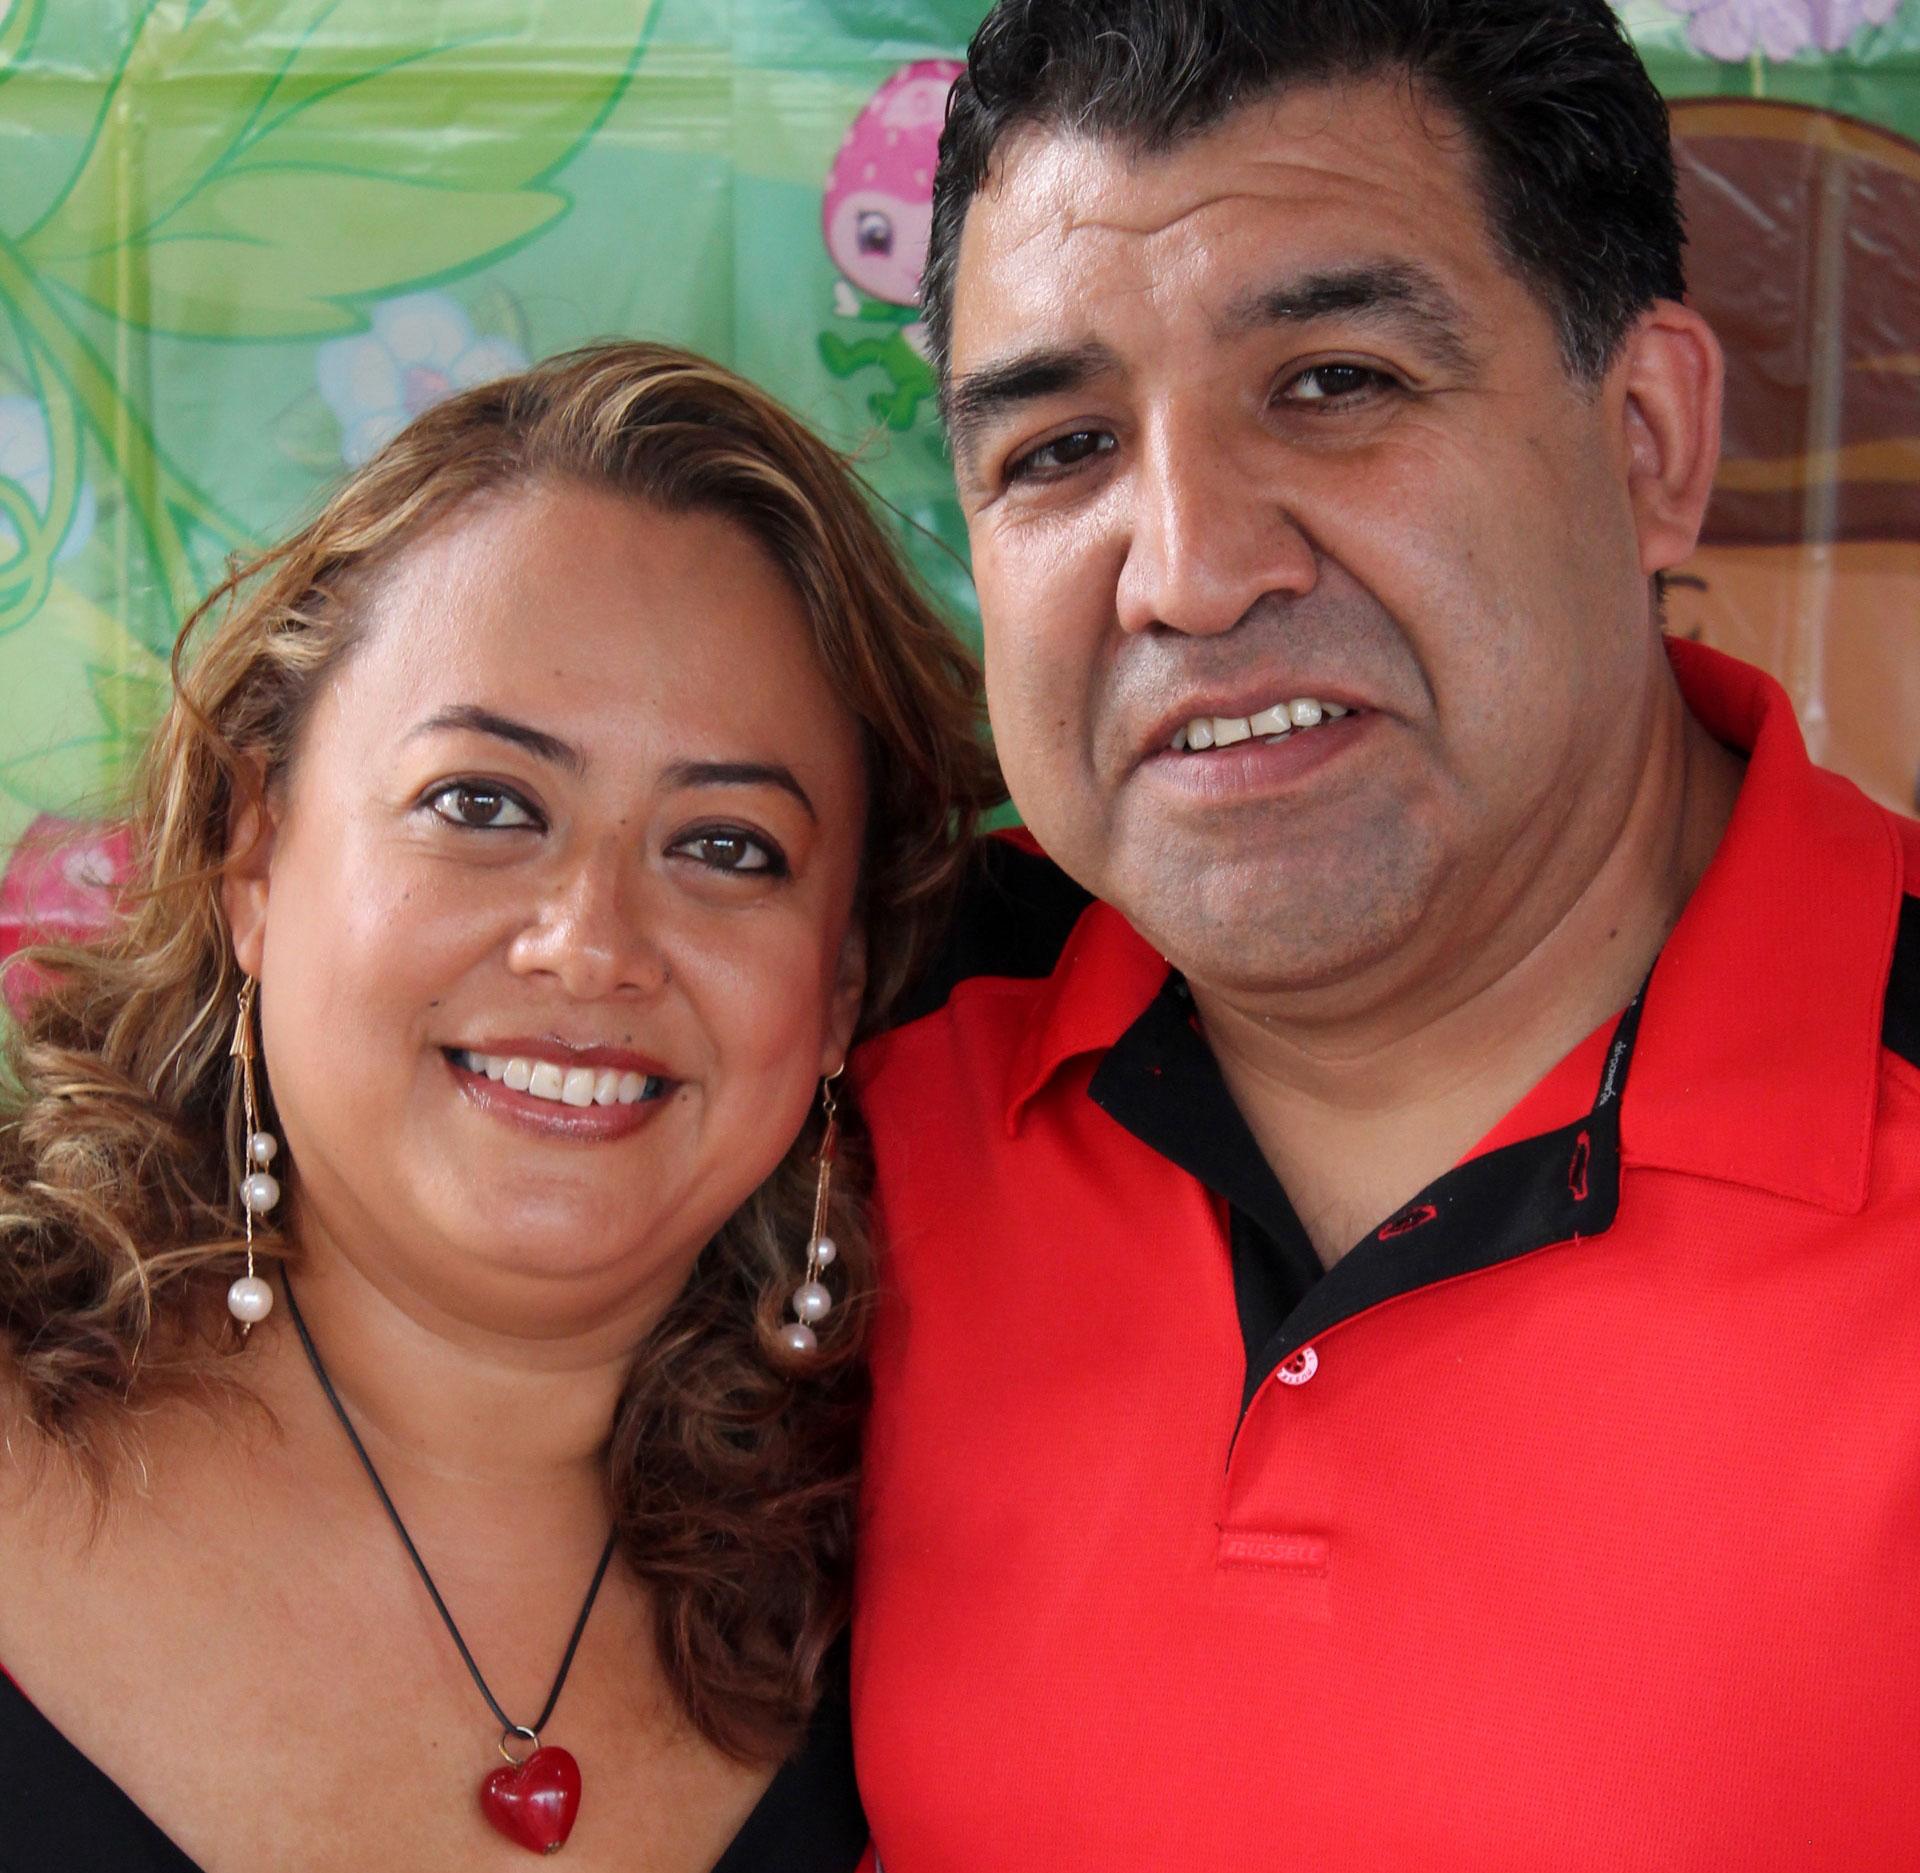 Jorge Arreola and Maria Magdalena Ortega Delgado are three years into an involuntary 10-year separation.